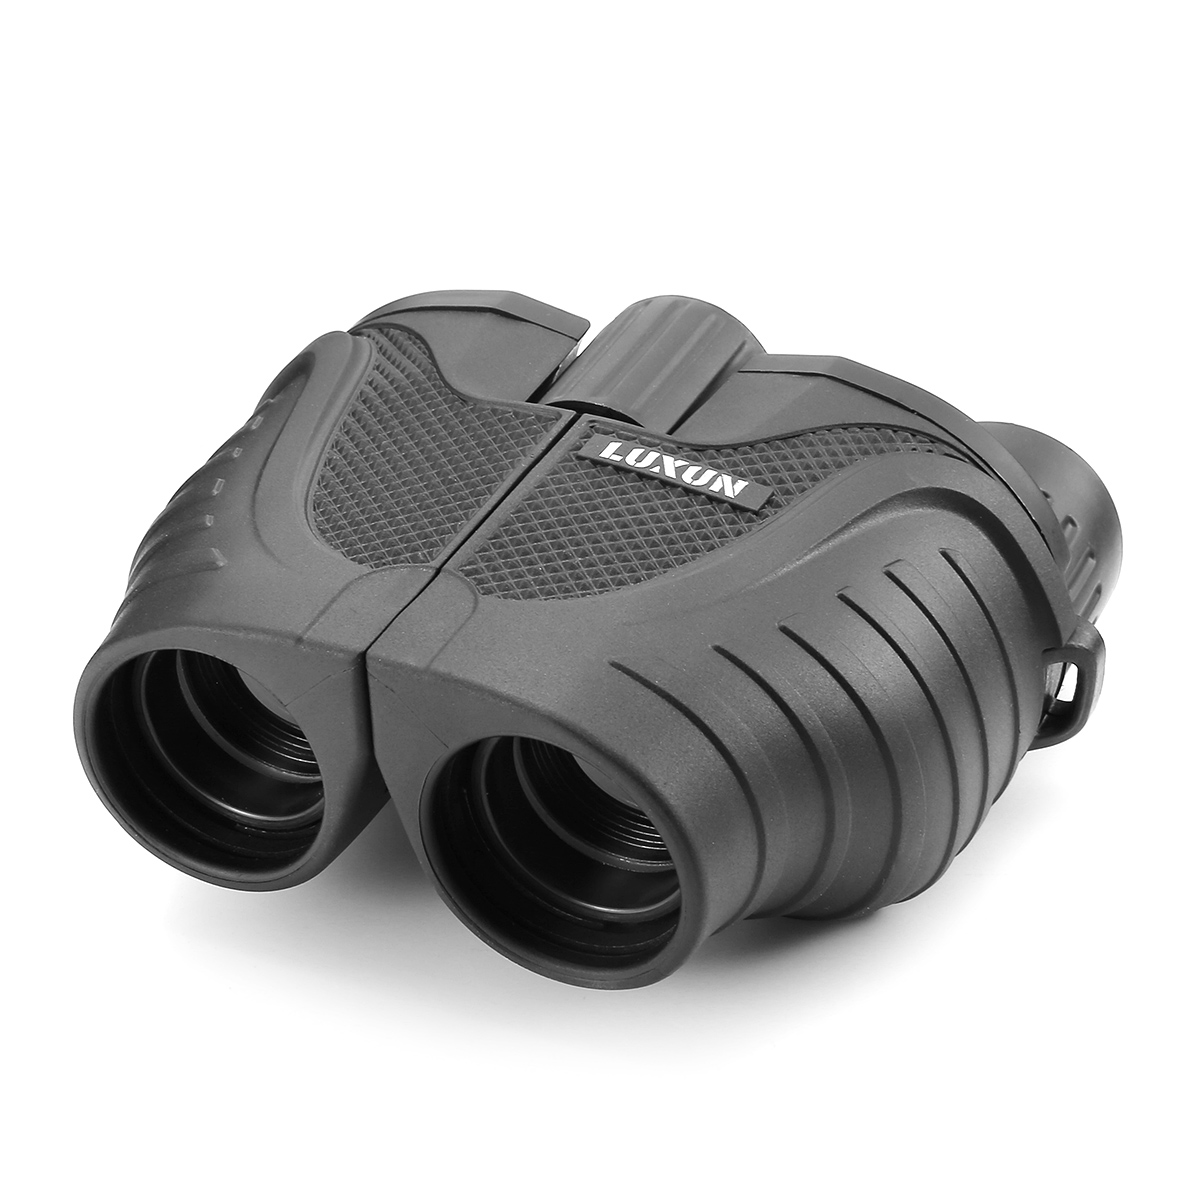 SGODDE 8x25 Compact Binoculars Waterproof Folding High Powered Binoculars with Weak Light Night Vision,Fully Coated Lens for Outdoor Bird Watching Travelling Concert